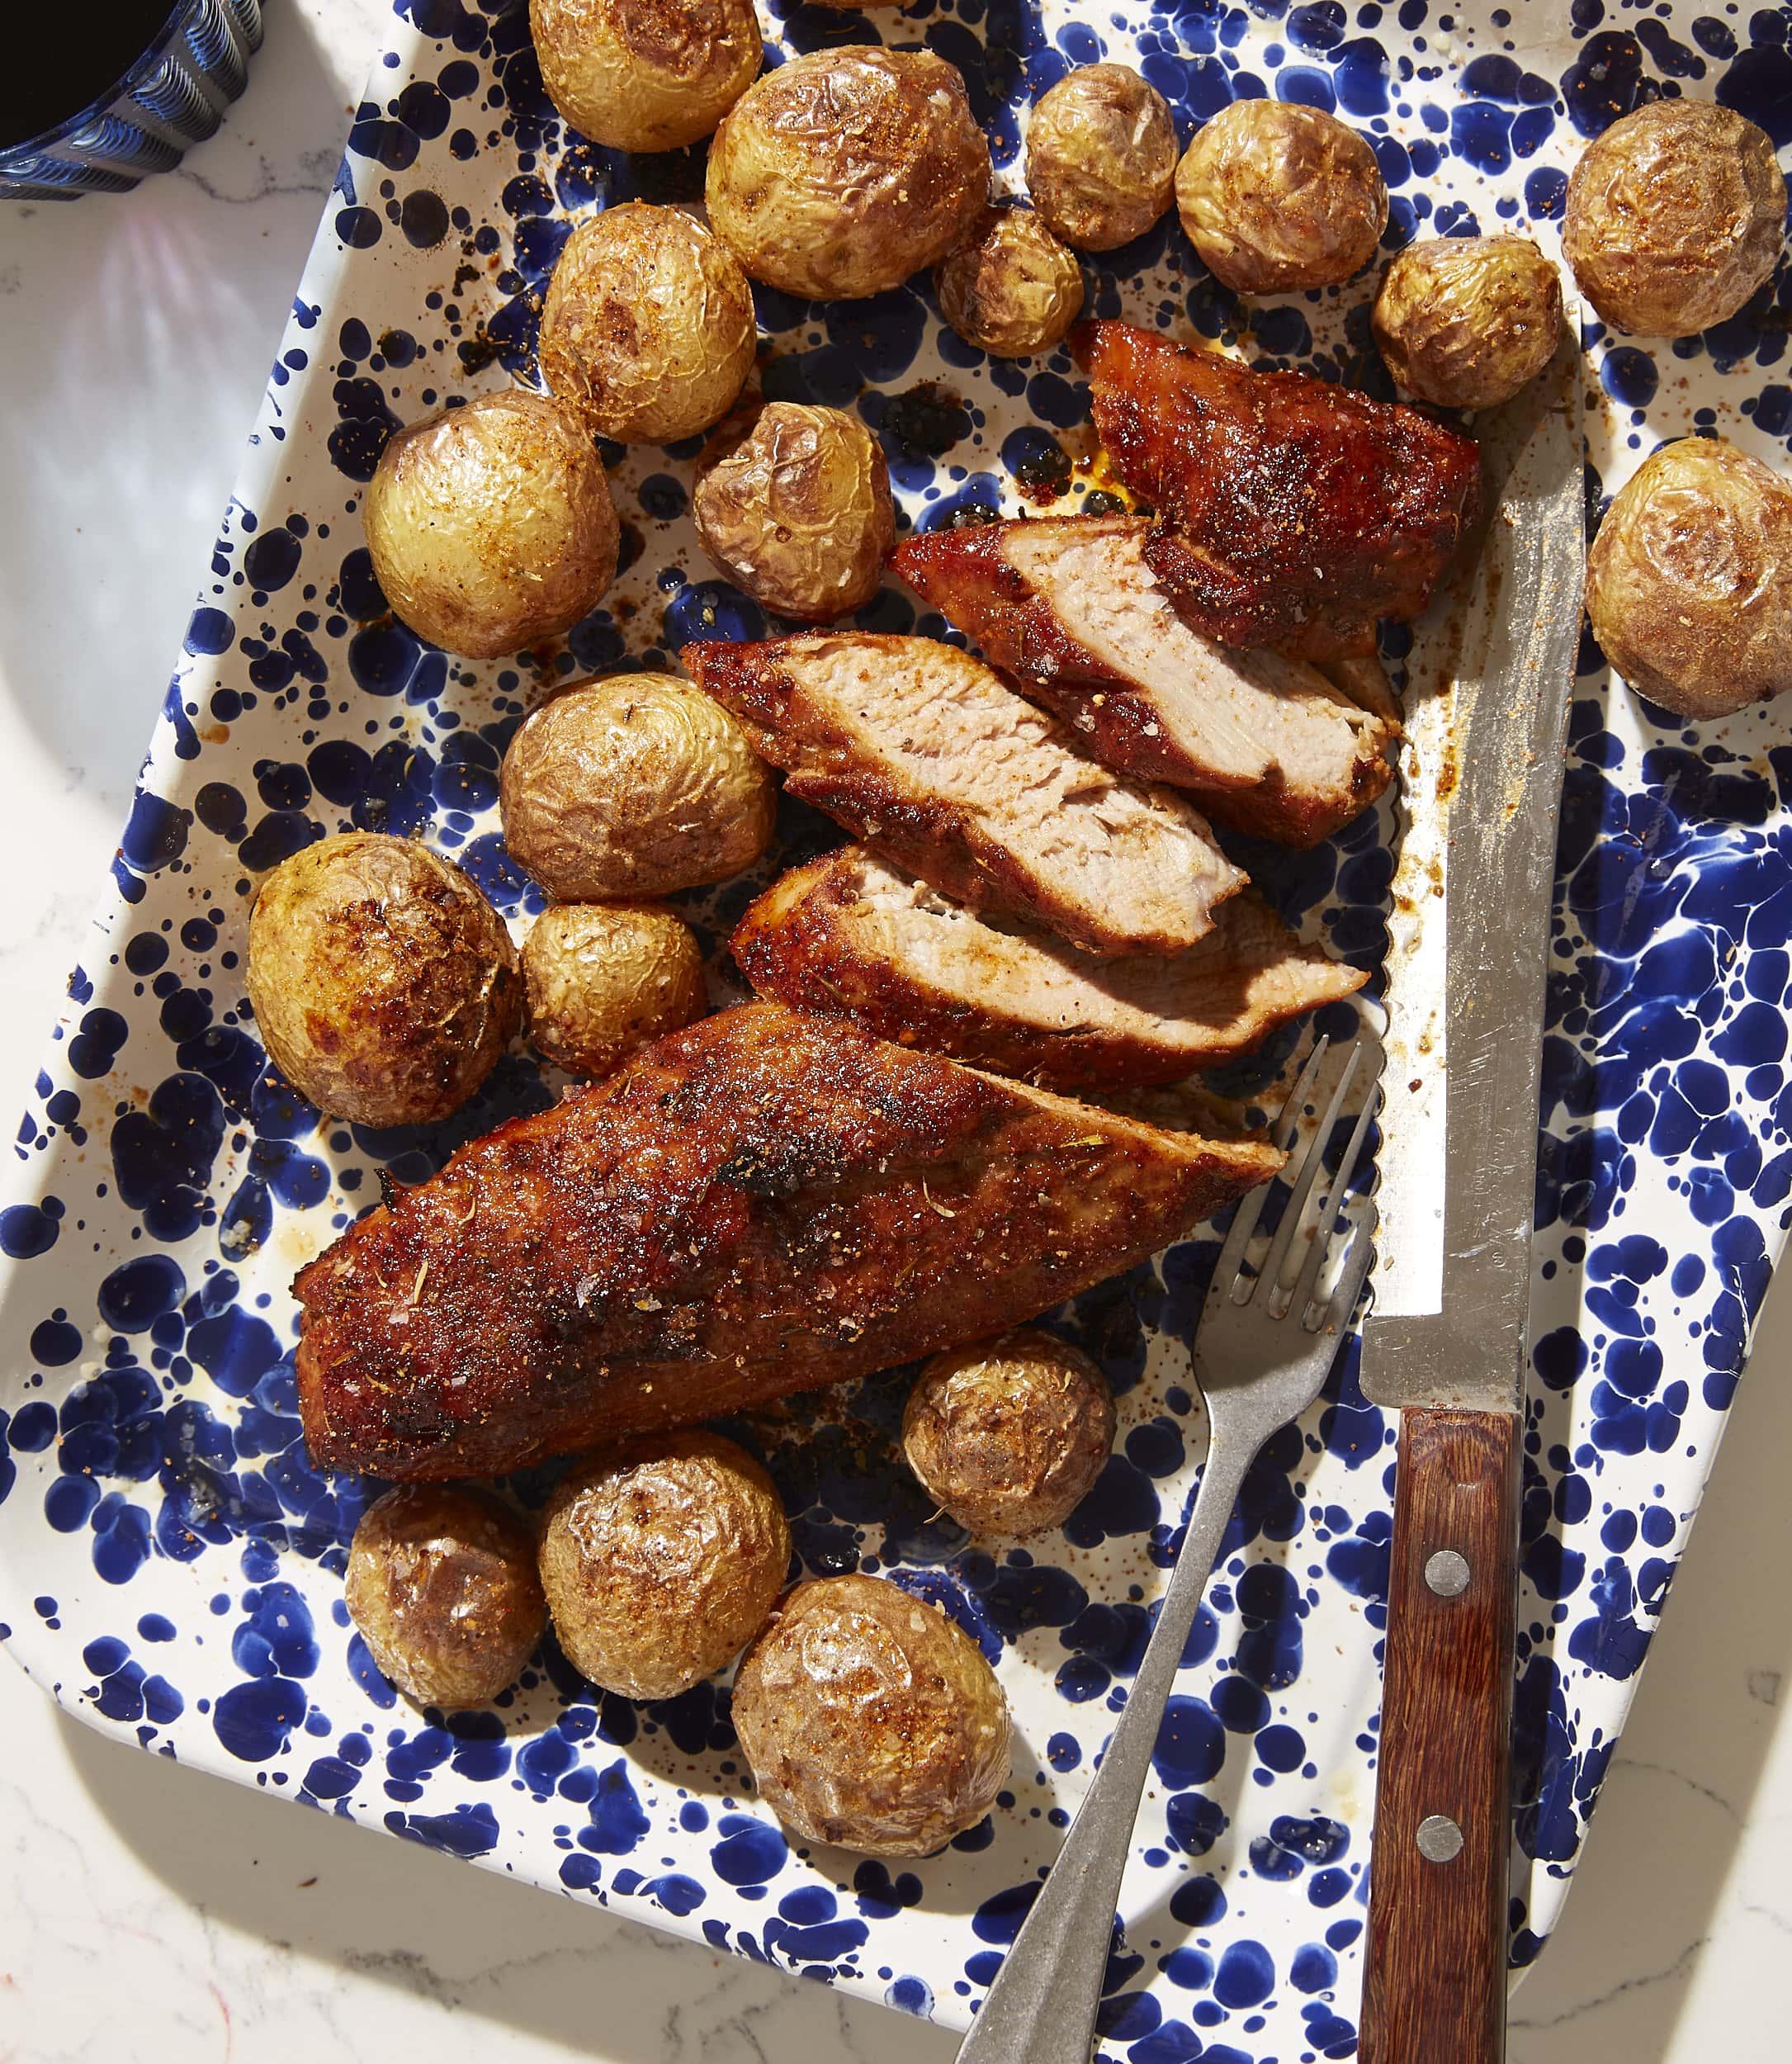 Rotisserie-Rubbed Pork Tenderloin and Potatoes